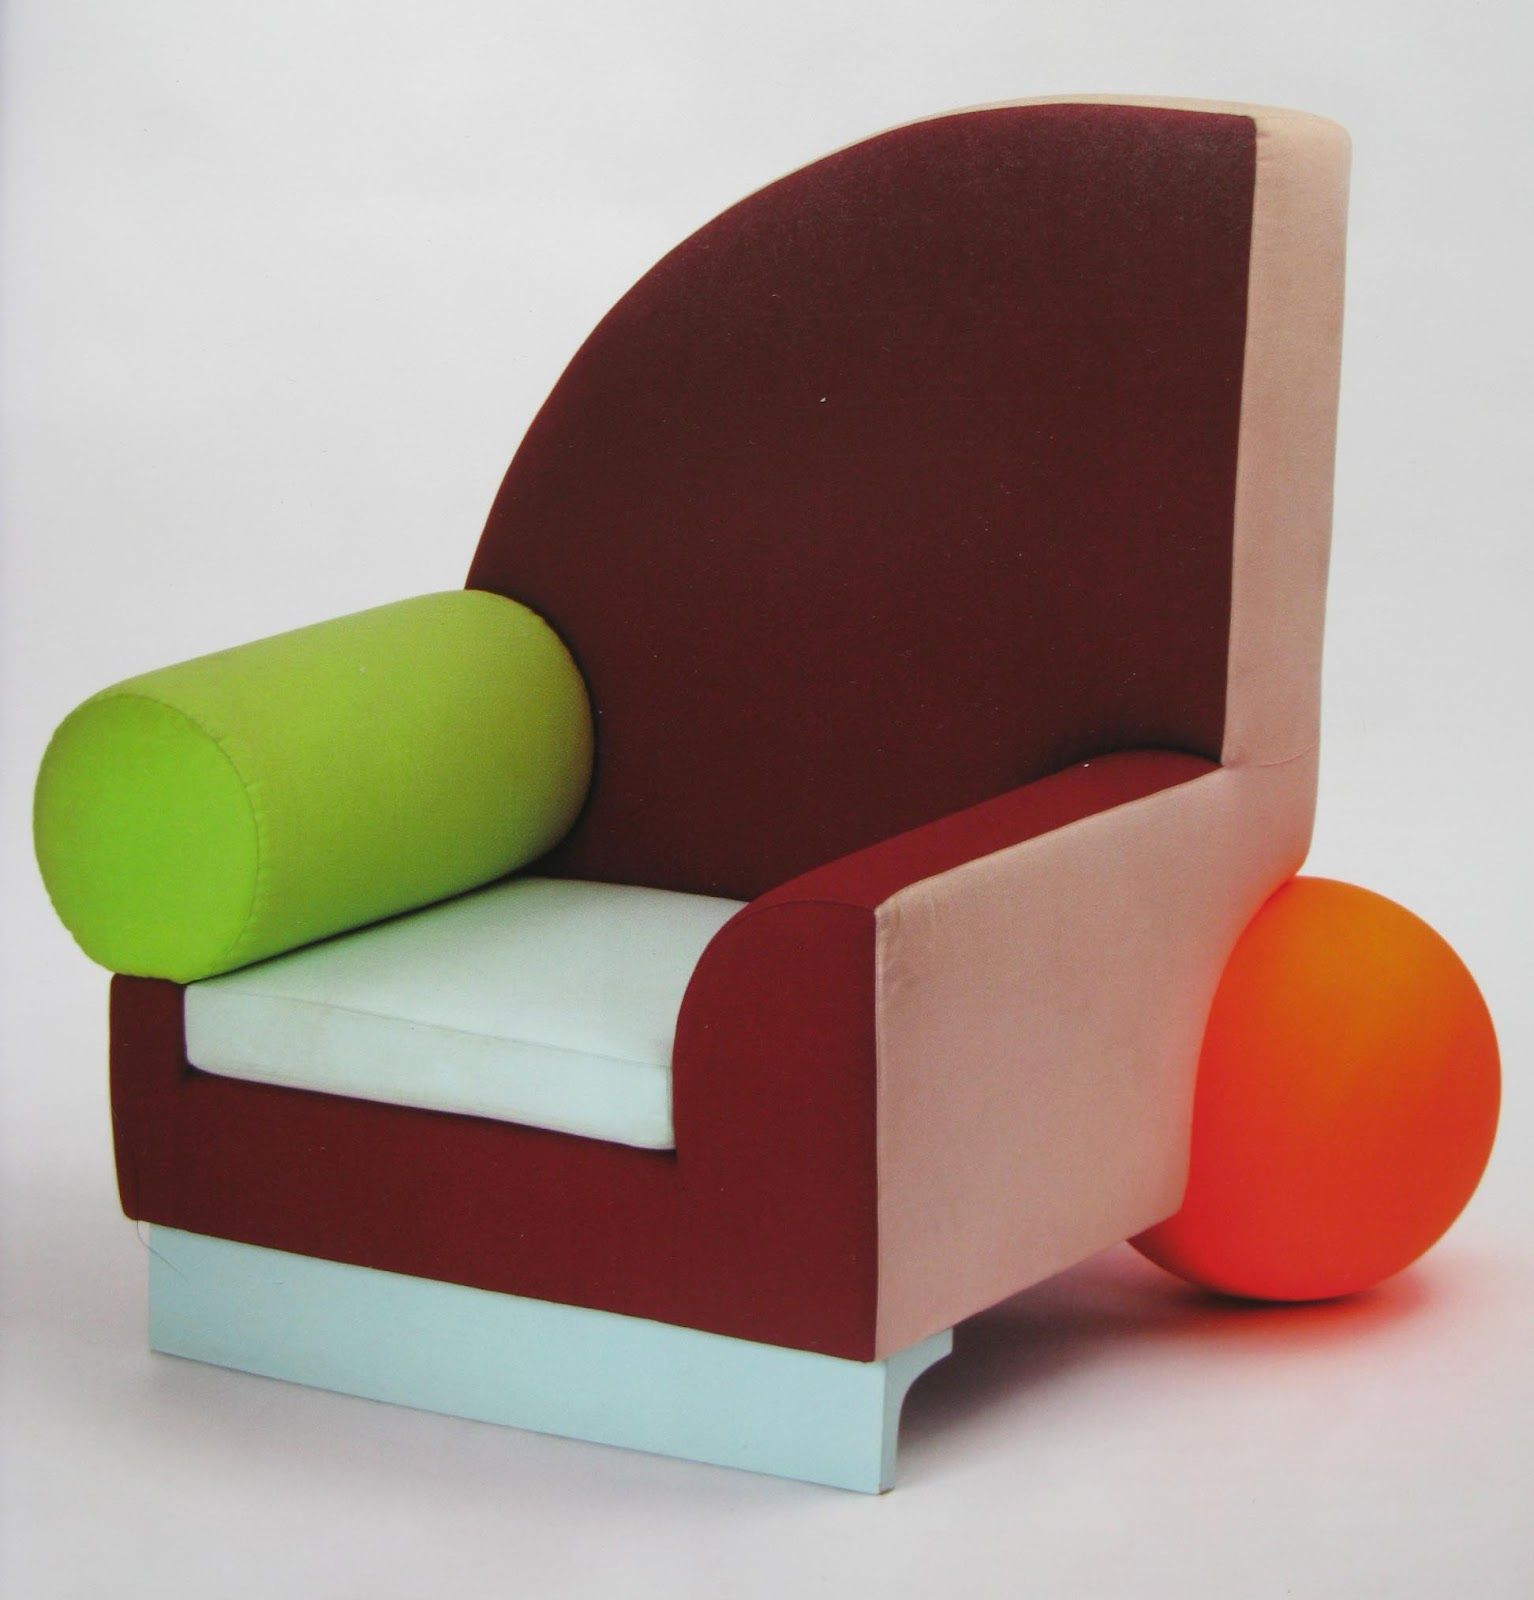 Memphis Furniture, Air